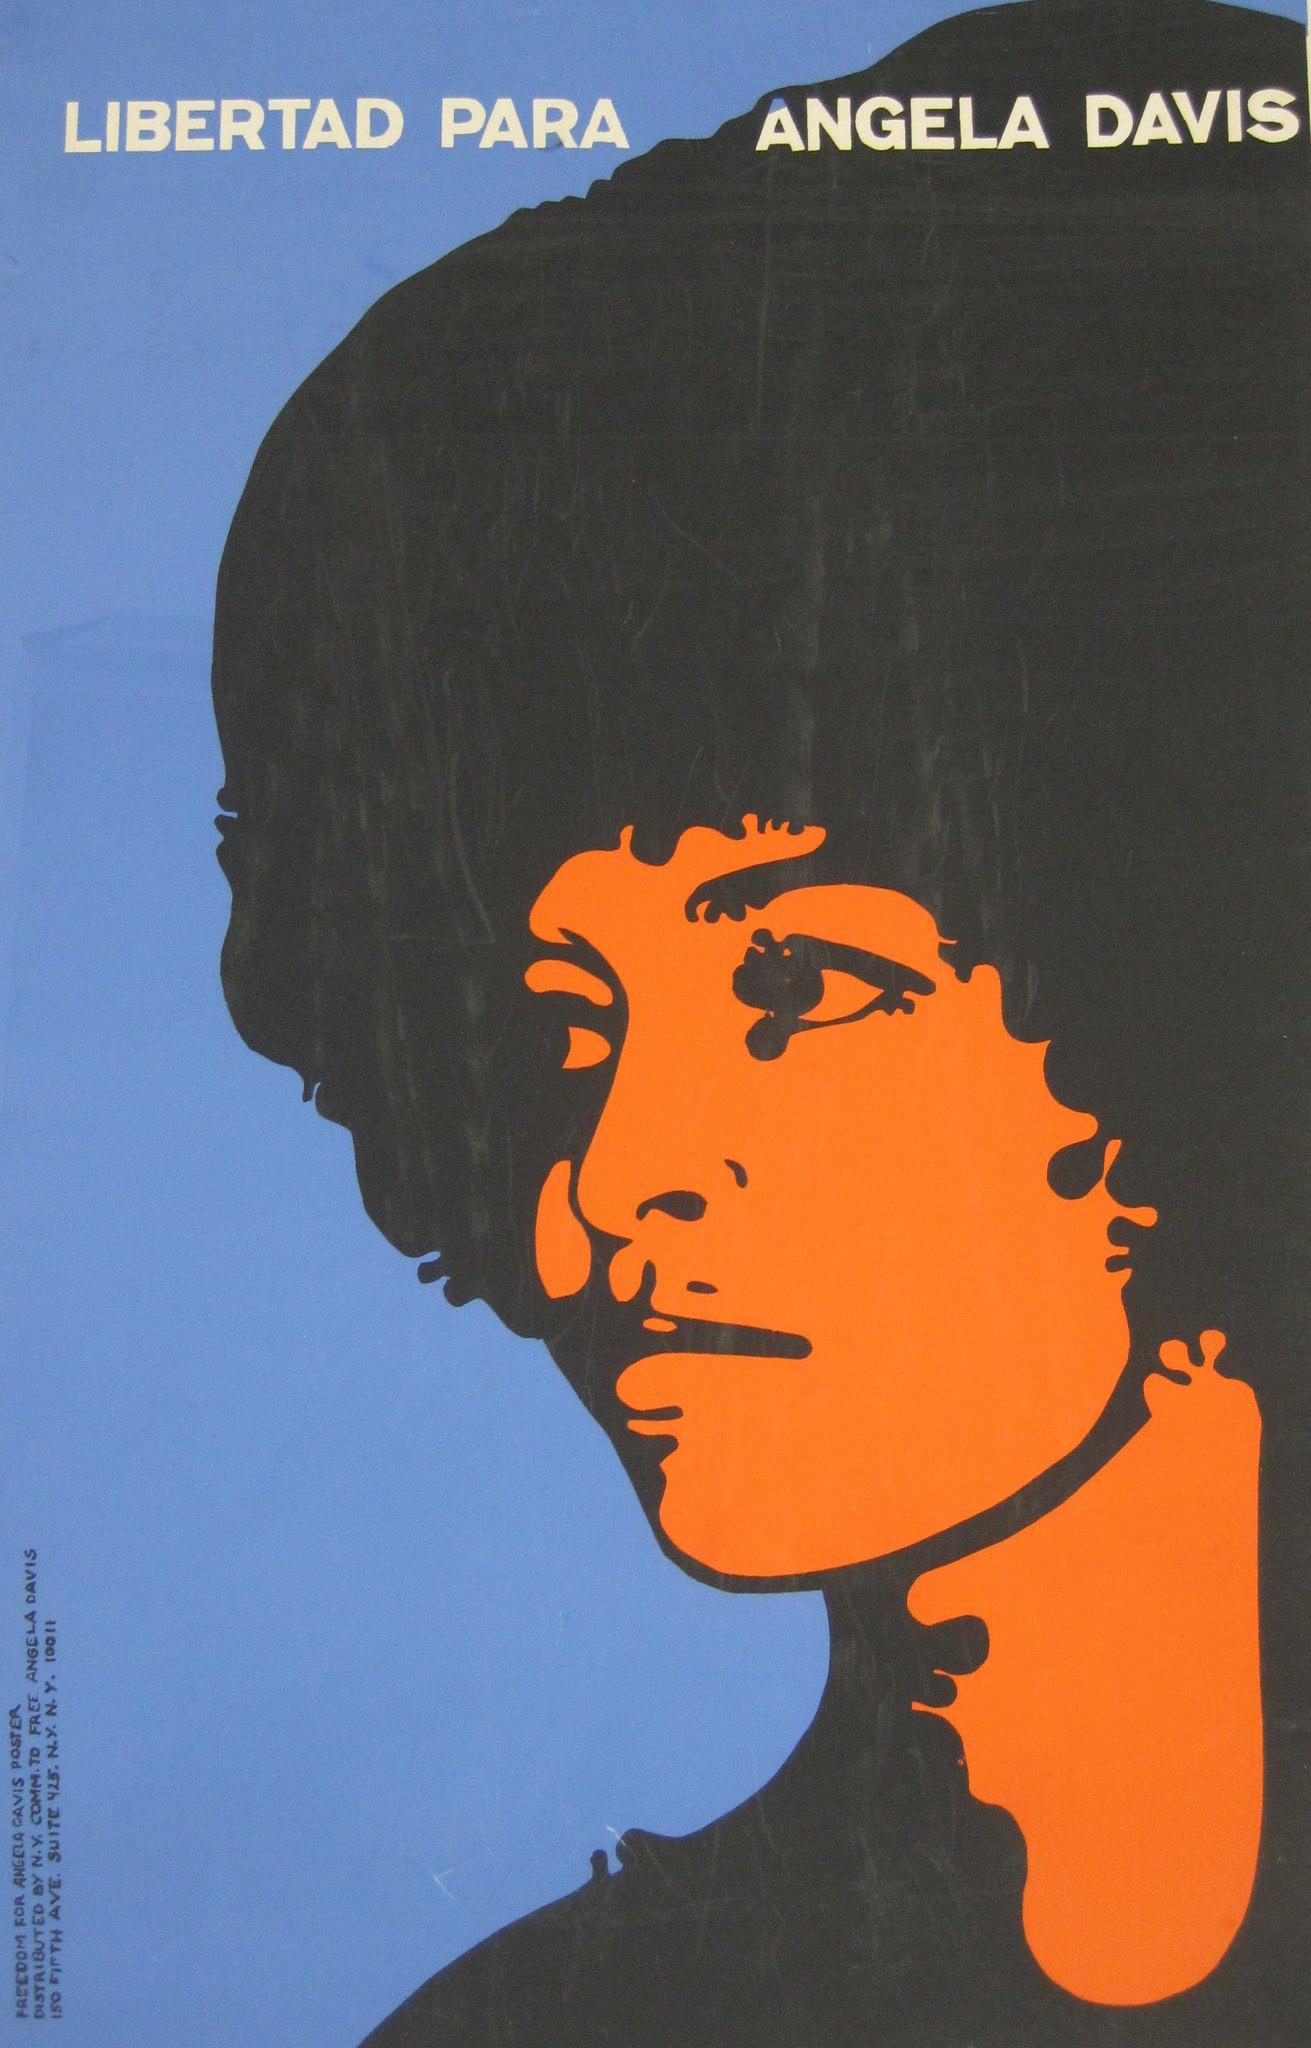 [United States] Libertad Para Angela Davis (1971)